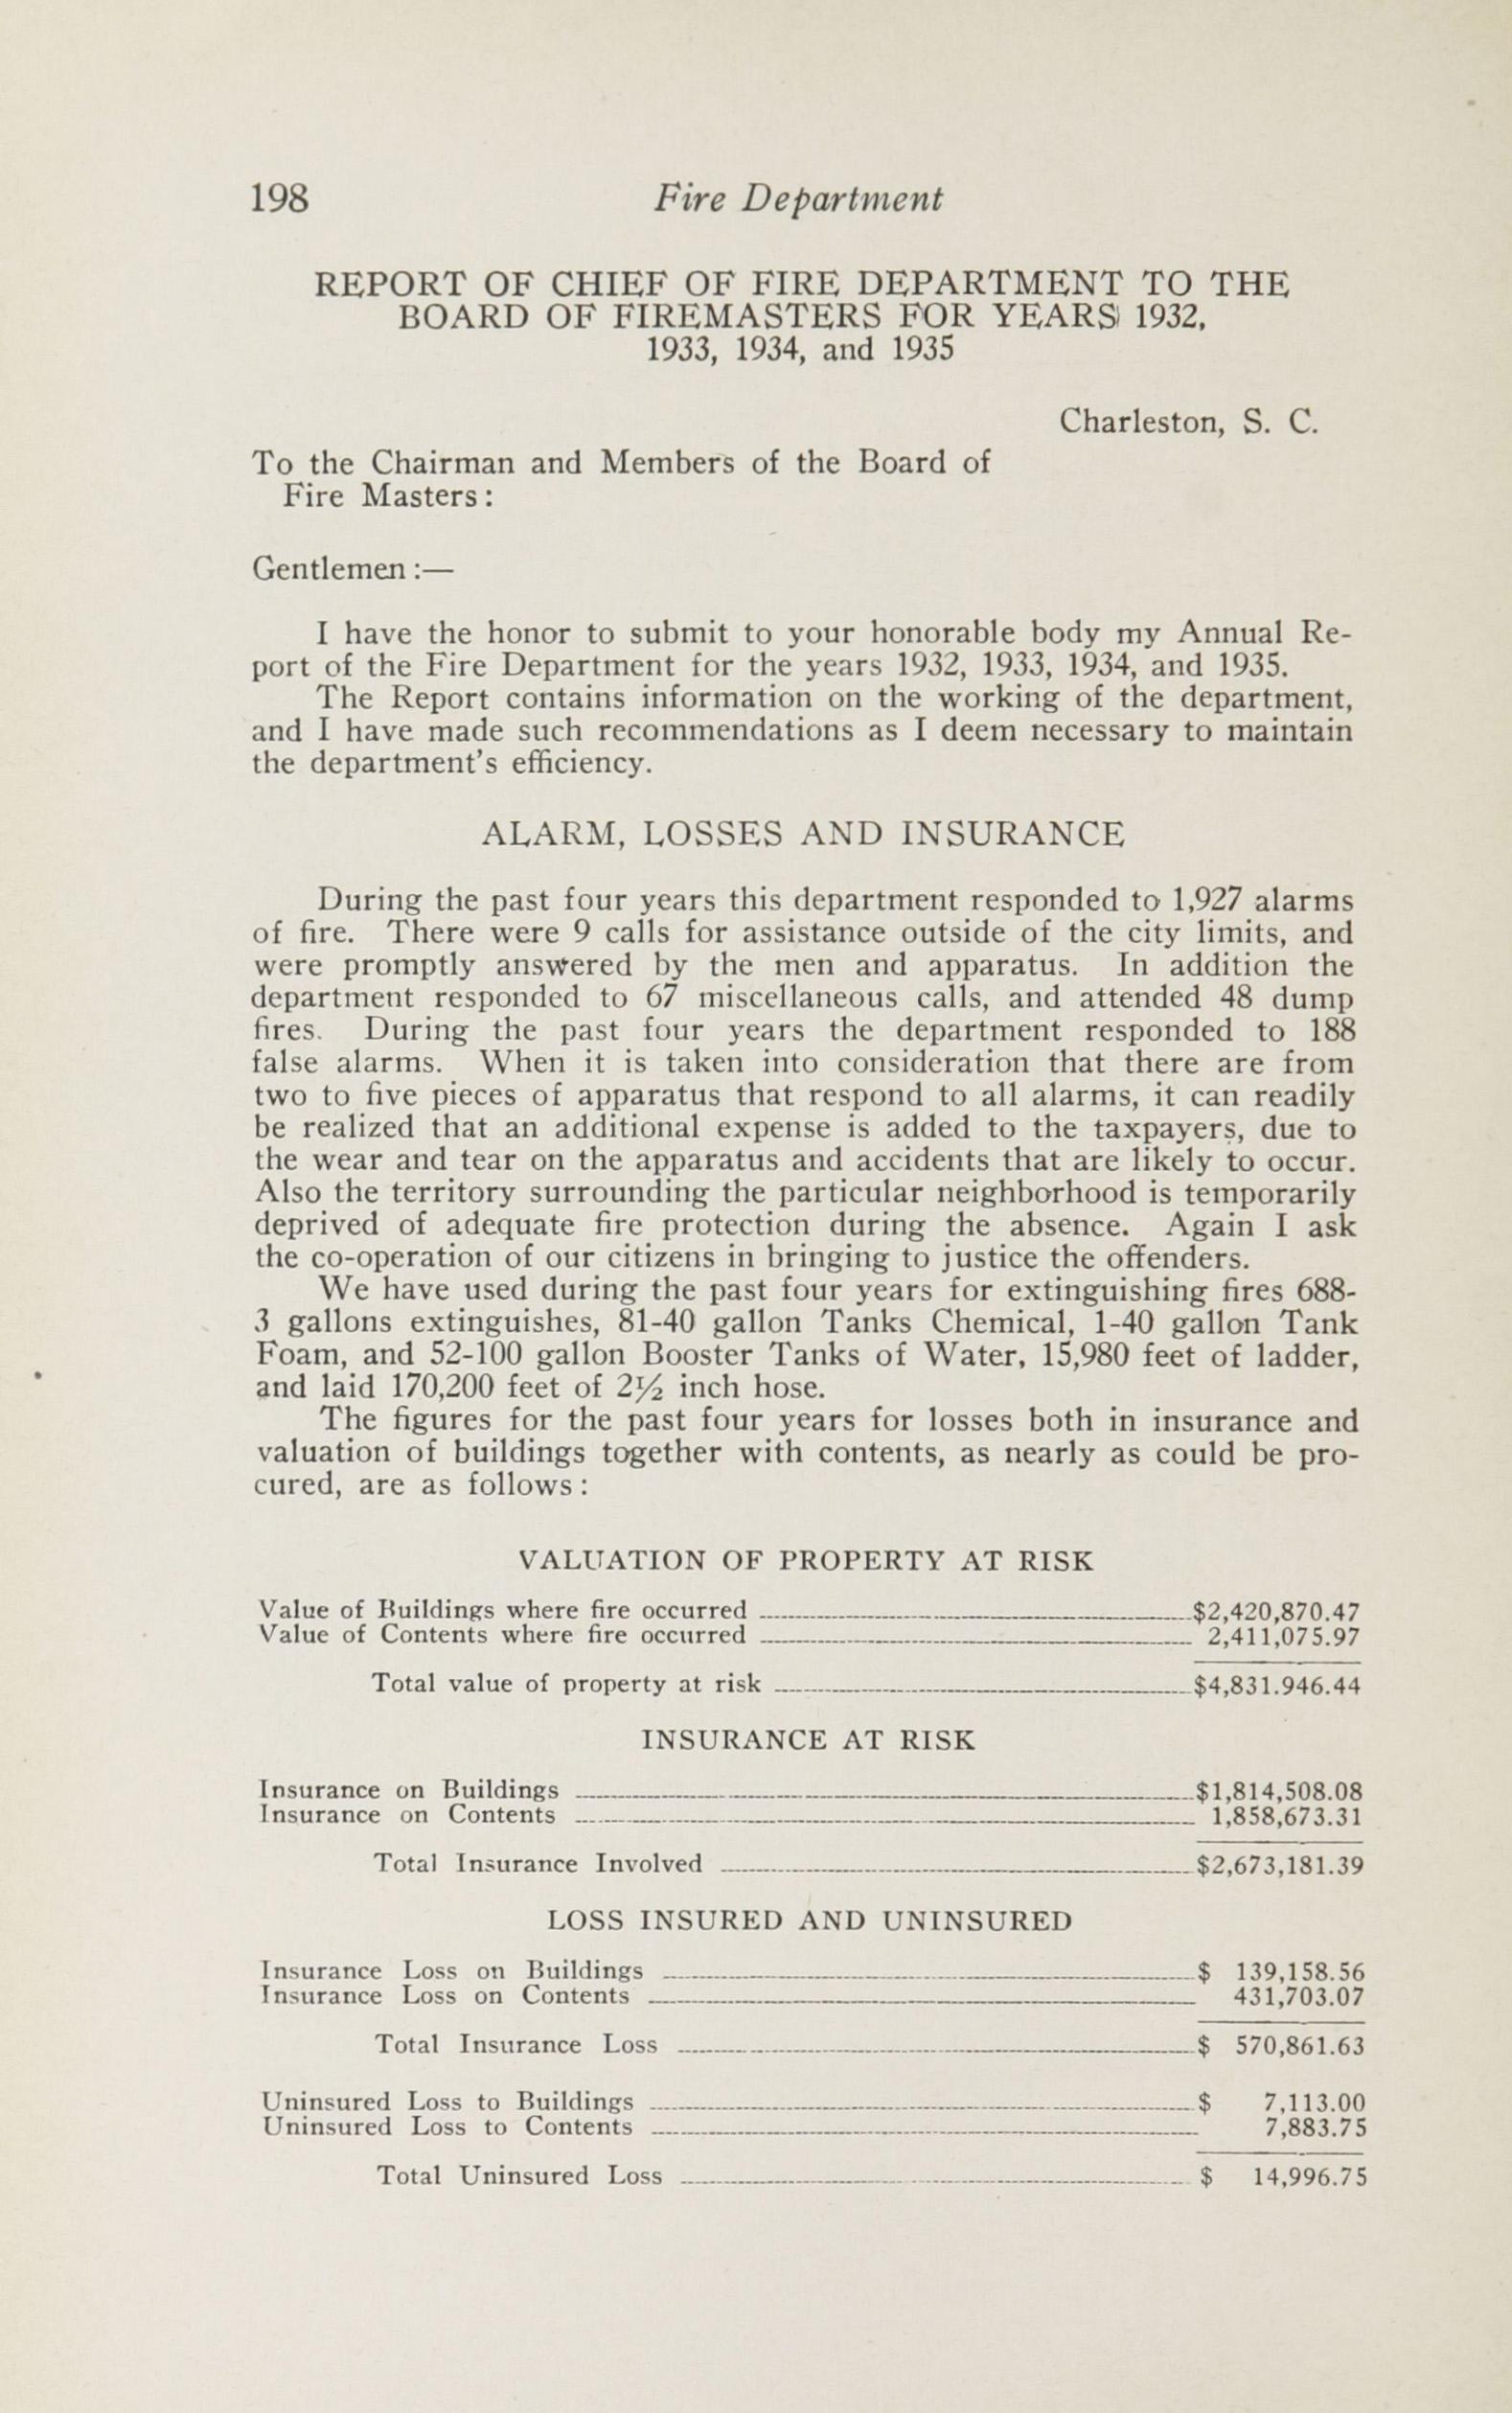 Charleston Yearbook, 1932-1935, page 198